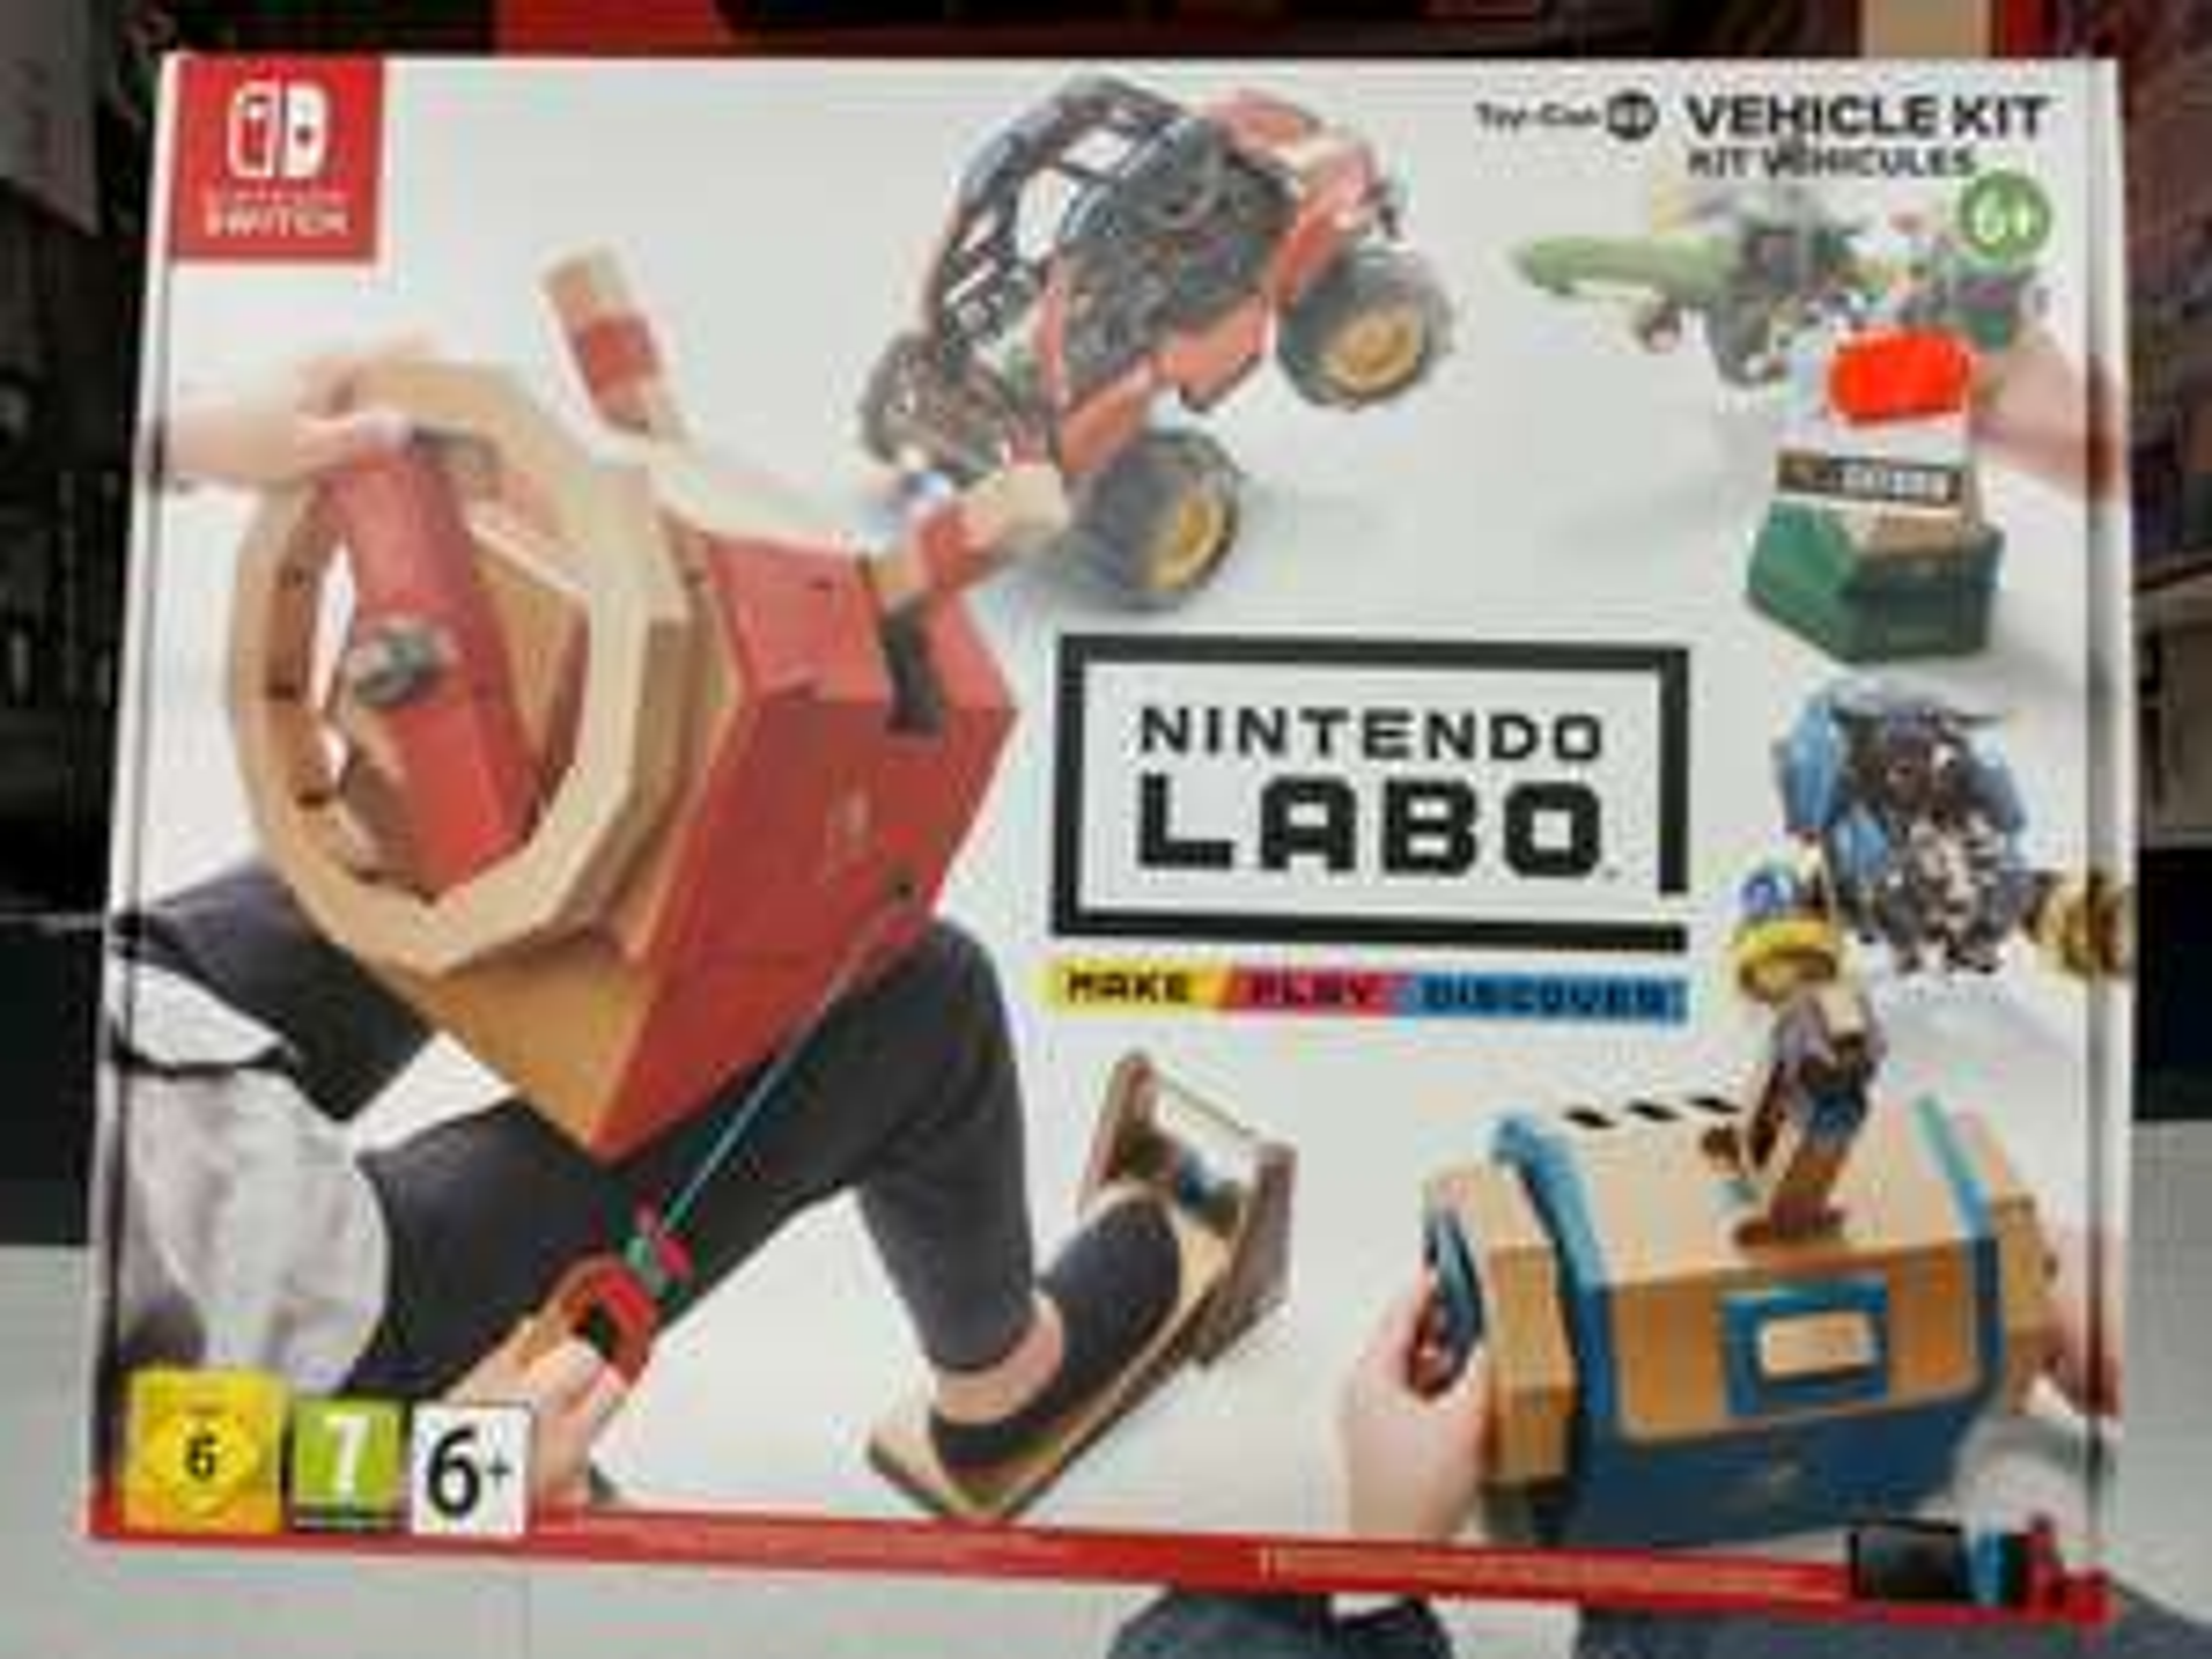 Nintendo Labo: Toy-Con 03 - Fahrzeug-Set [Saturn Berlin Gesundbrunnen]